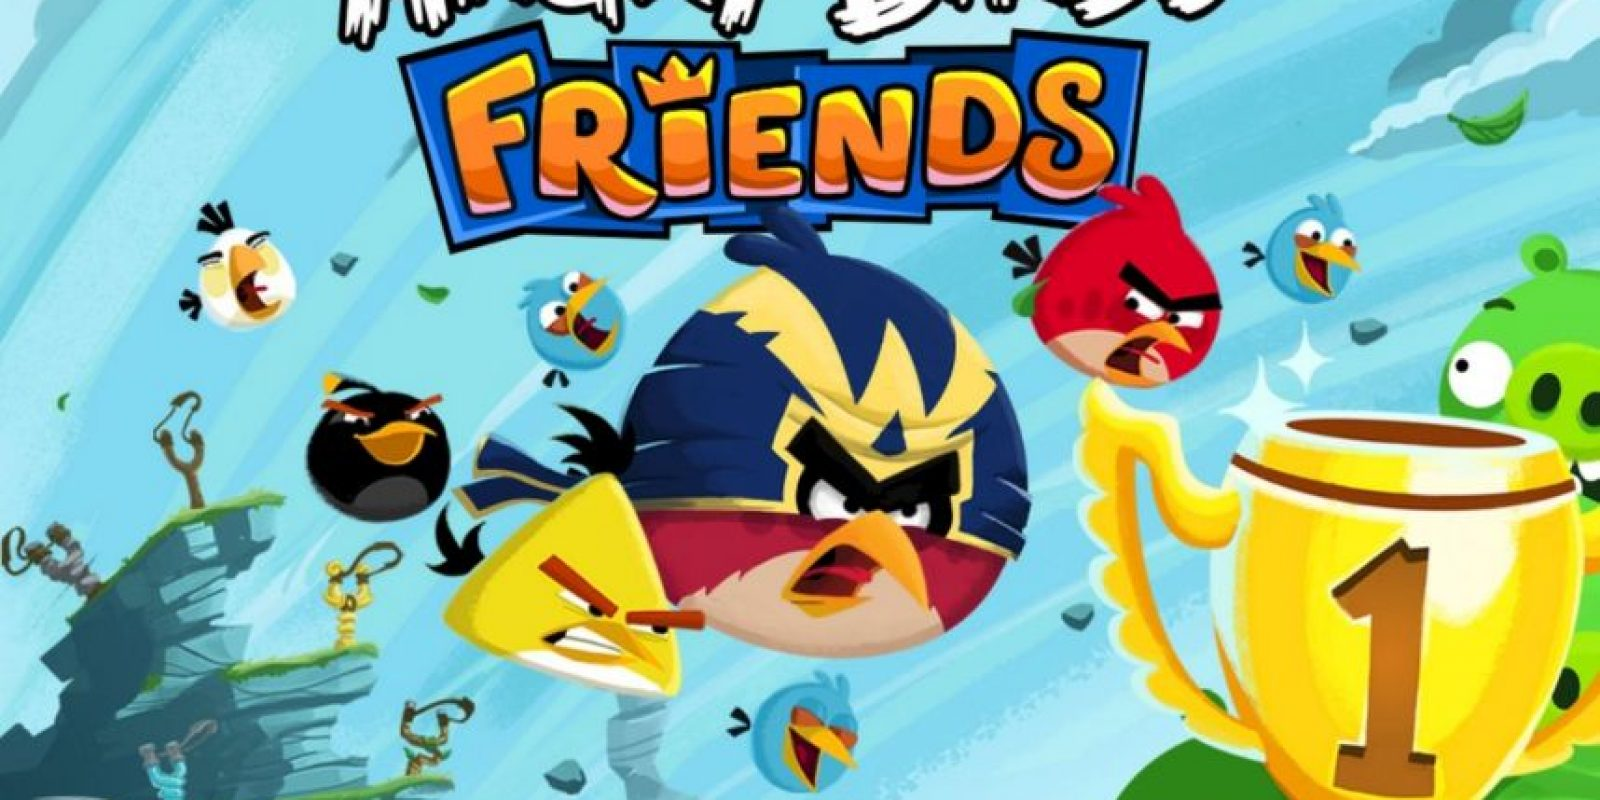 Angry Birds Friends (2012) Foto:Rovio Entertainment Ltd